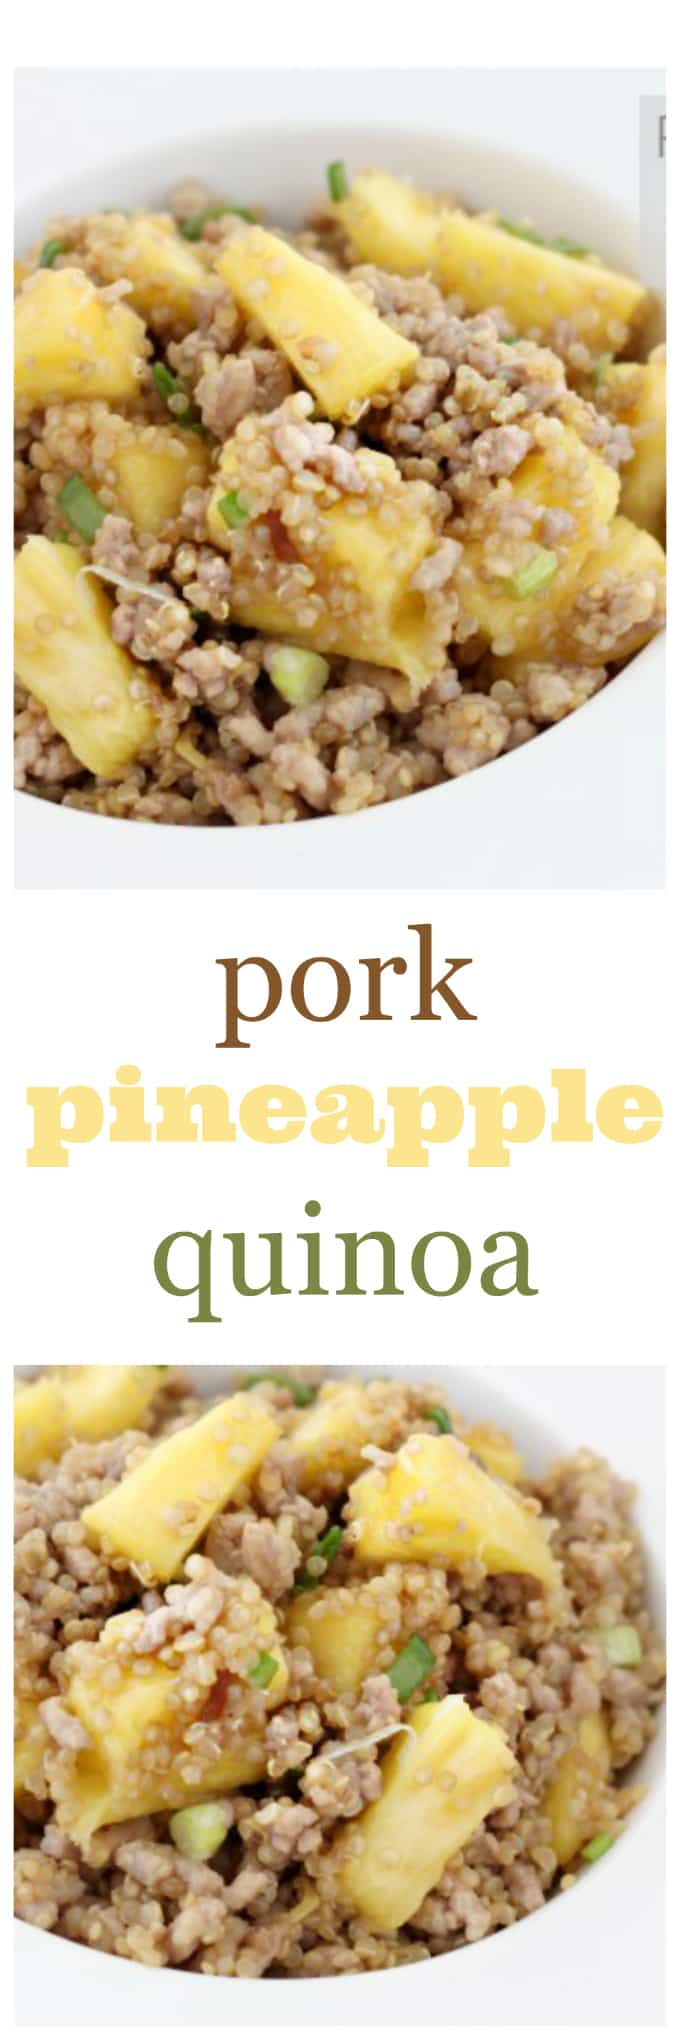 pork pineapple quinoa @createdbydiane